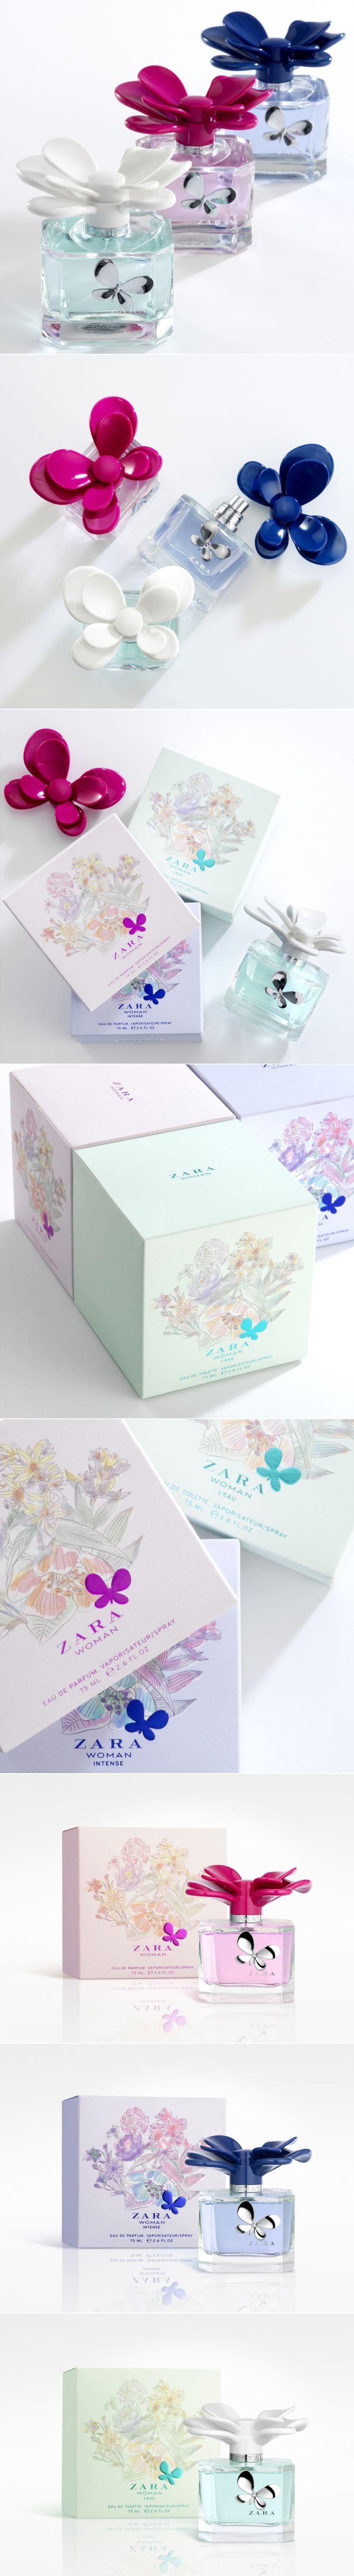 ZARA Woman Perfume — The Dieline | Packaging & Branding Design & Innovation News